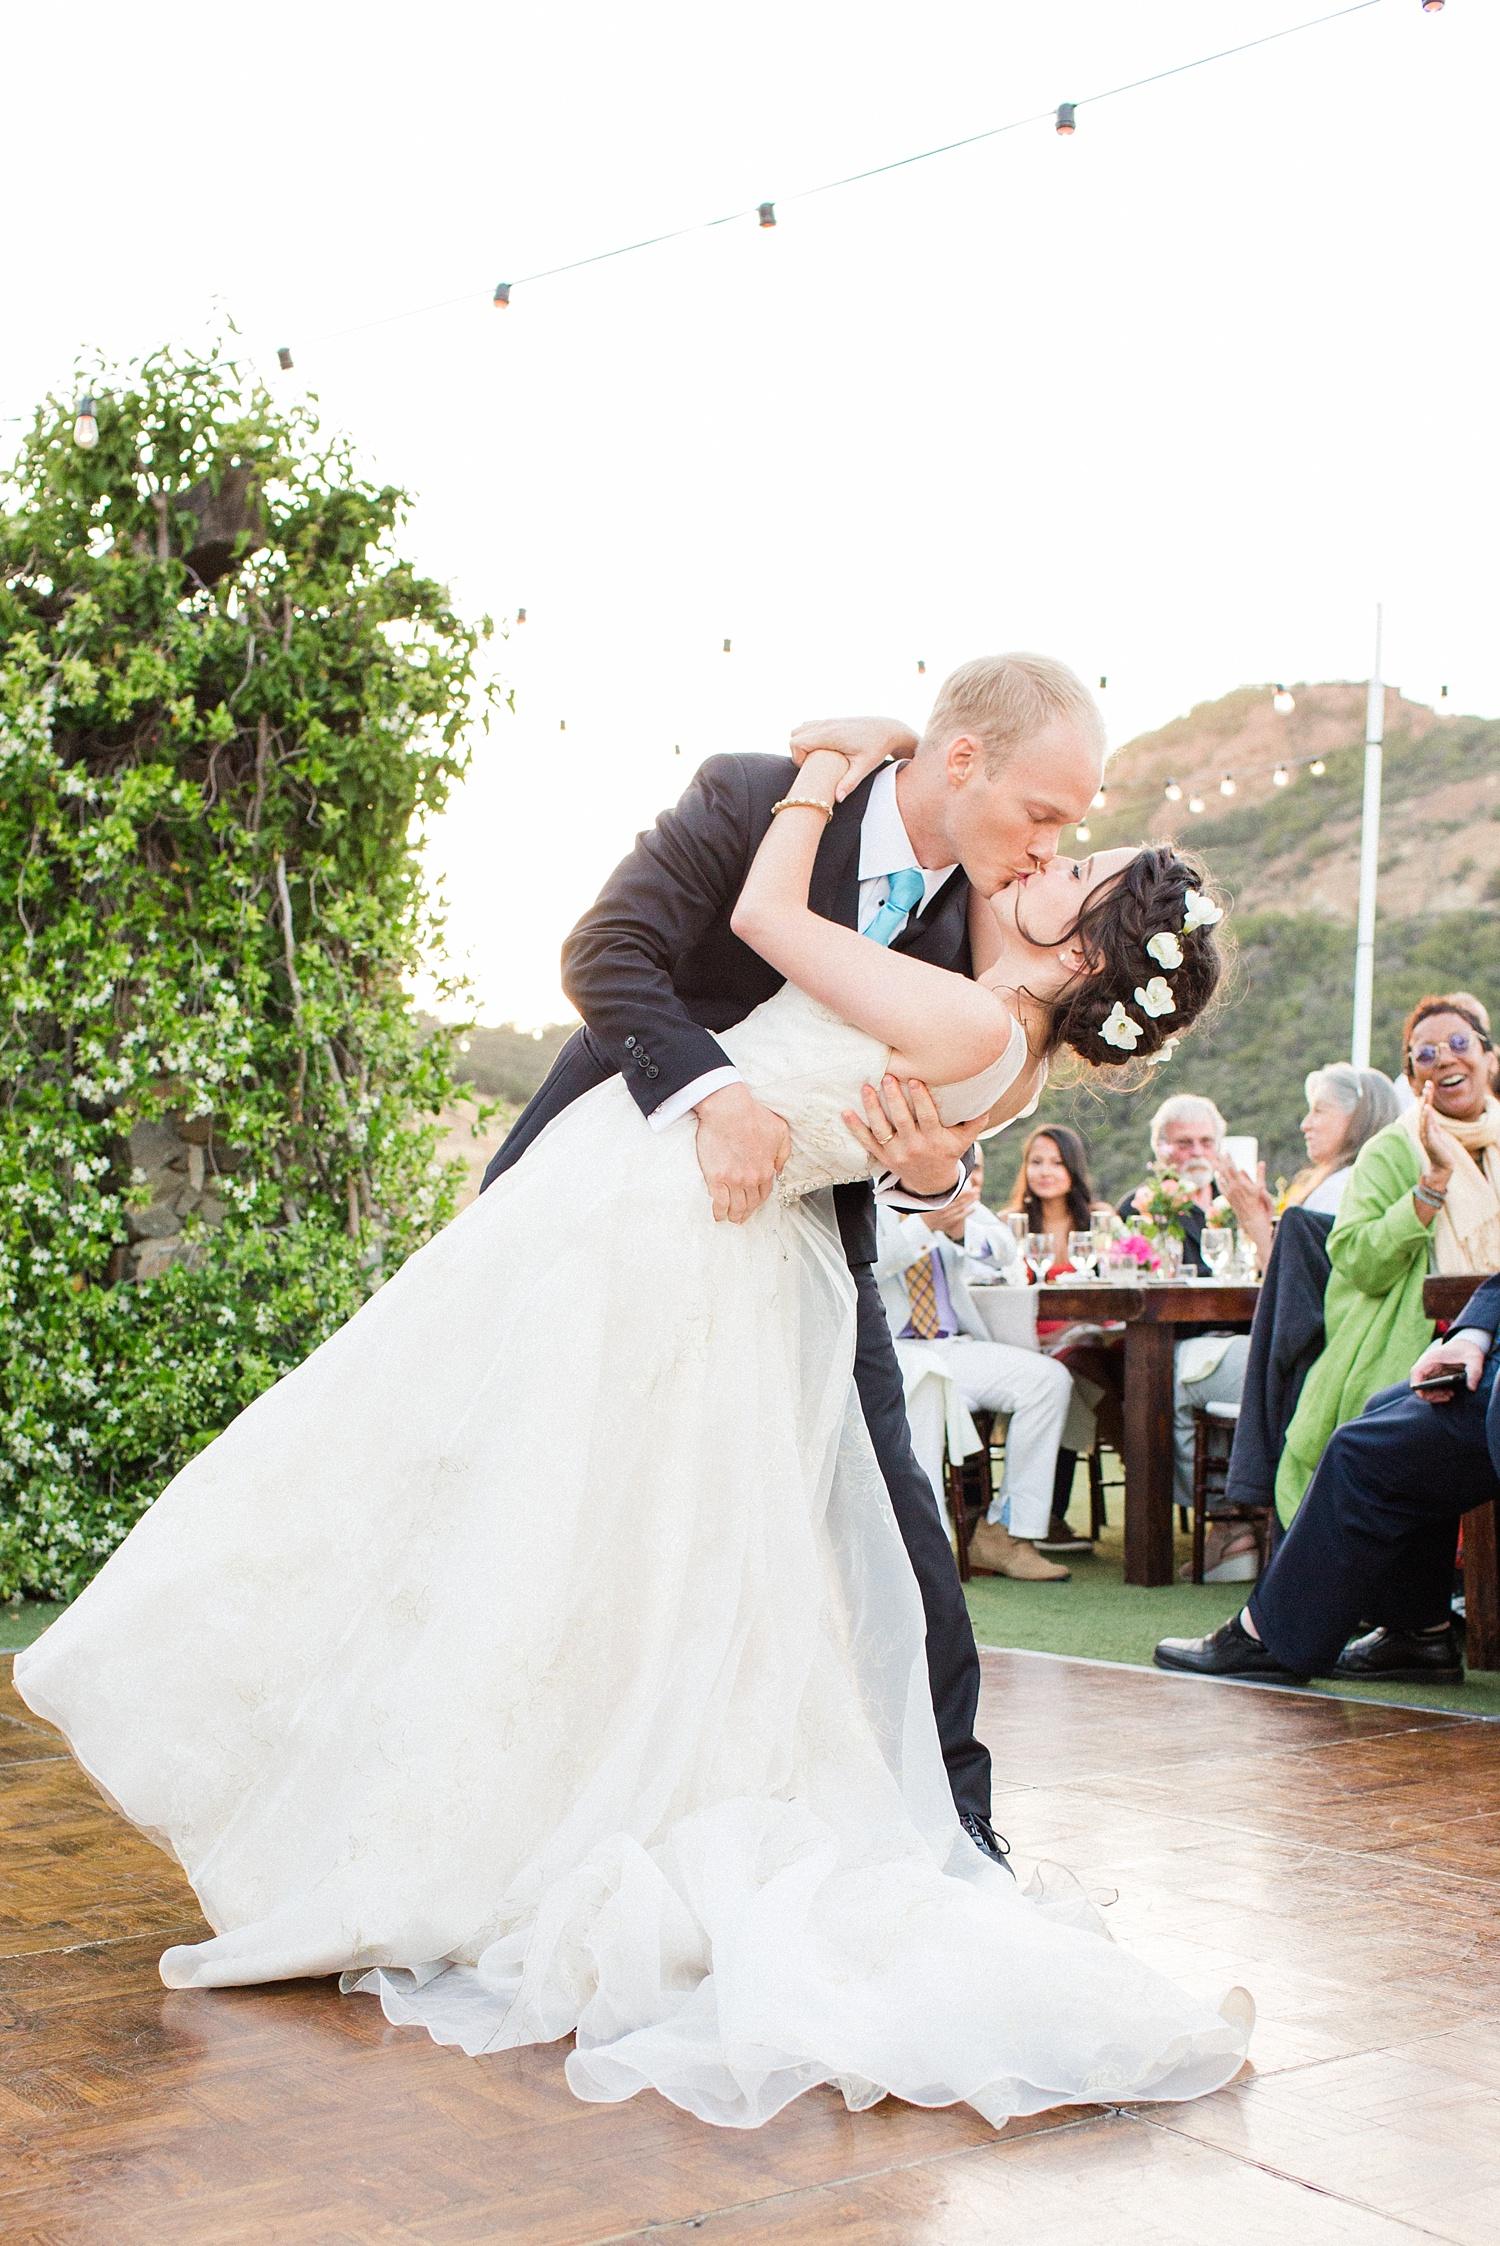 thevondys.com   Saddlerock Ranch   Malibu Wedding Photographer   The Vondys